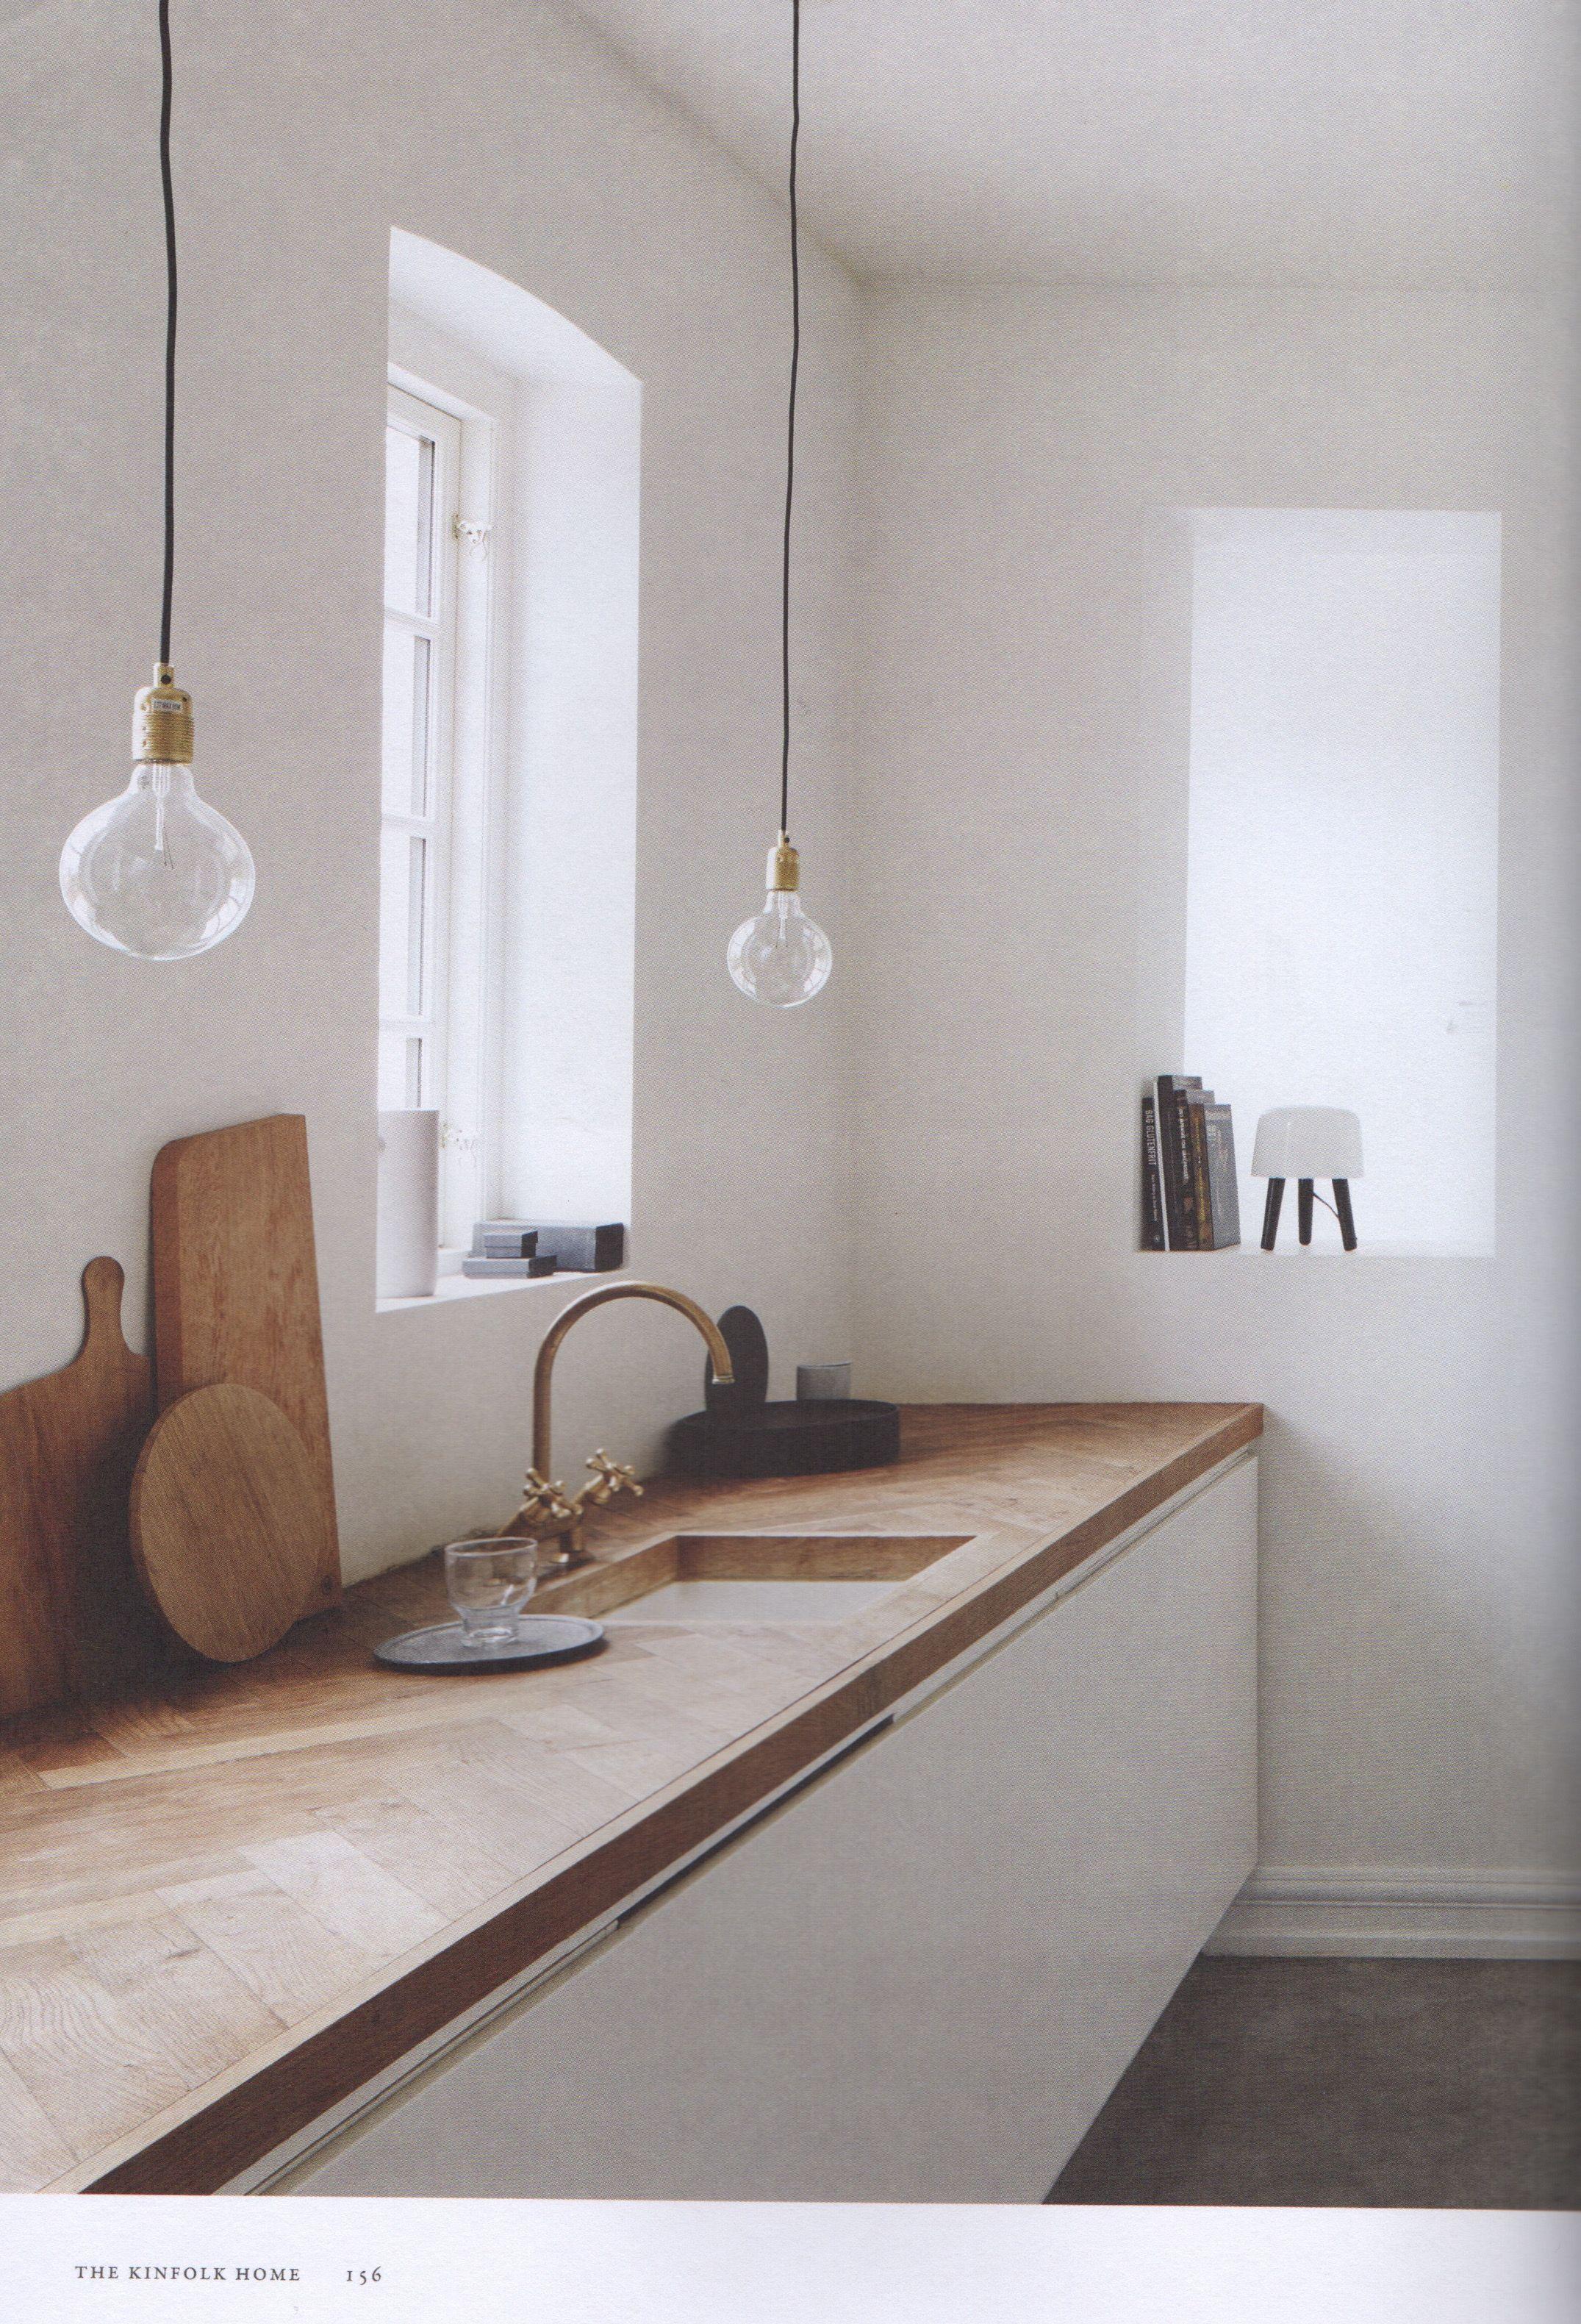 Kinfolk Home  Herringbone Counter More